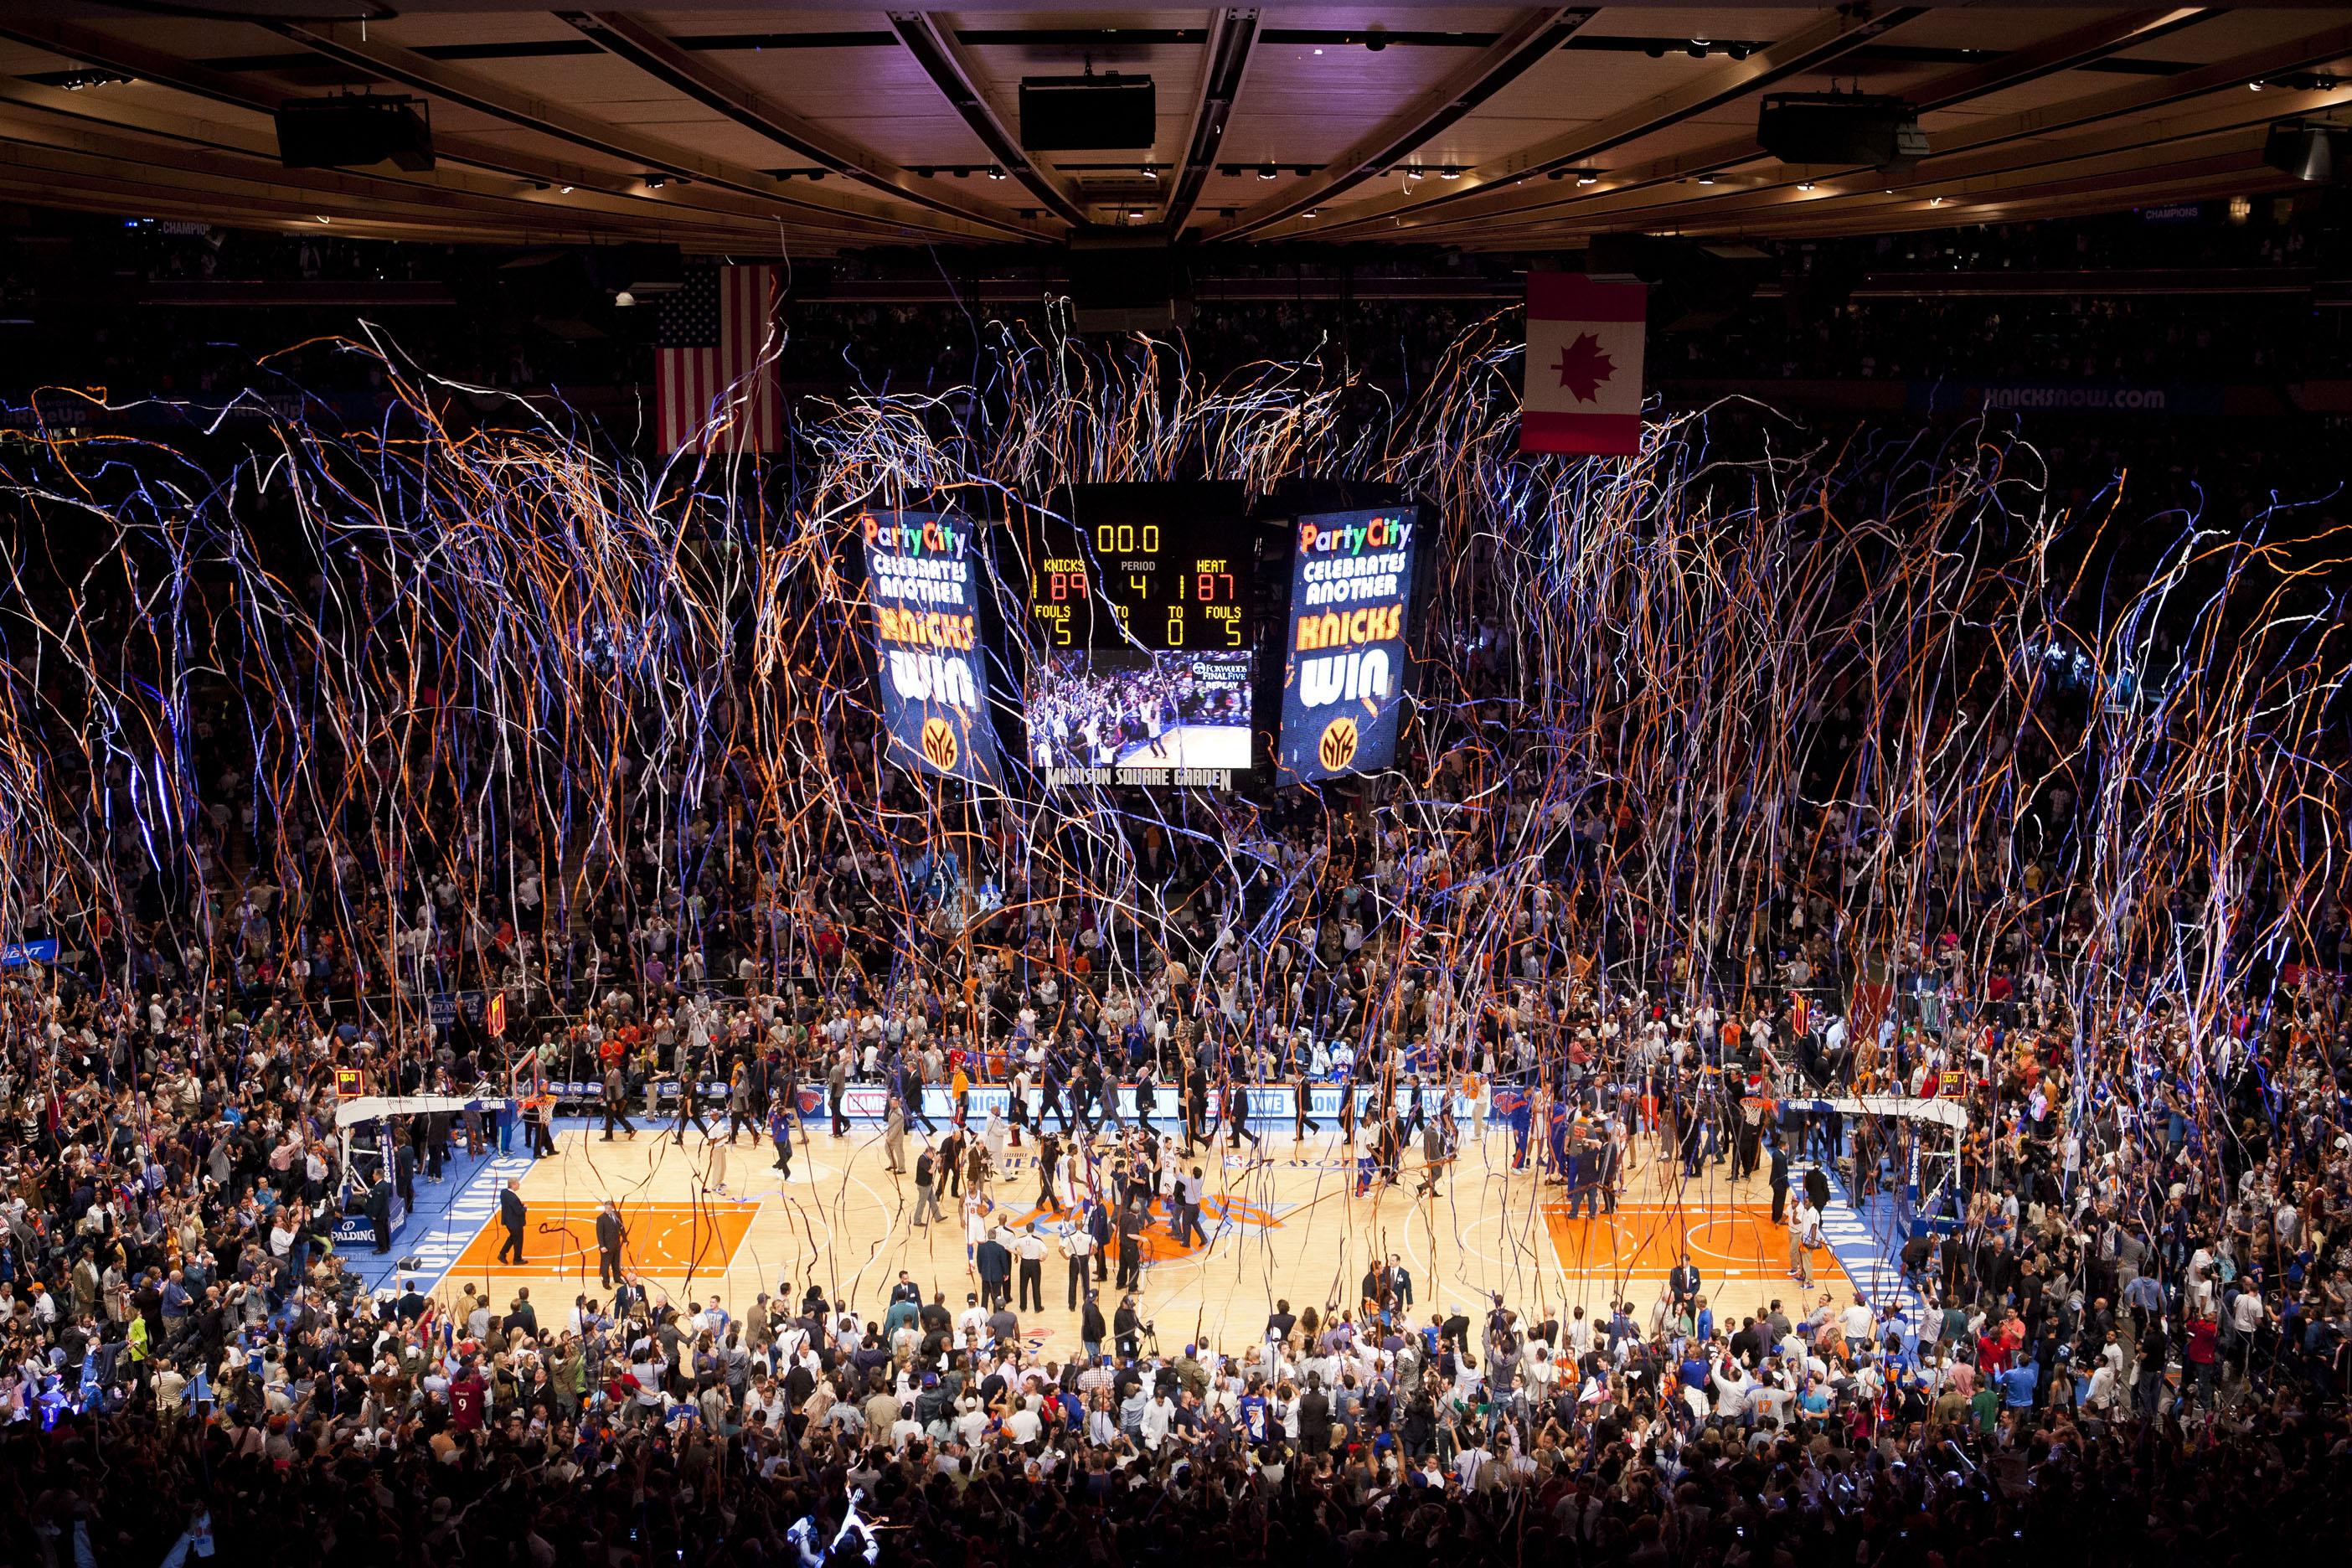 2012 NBA Playoffs - New York Knicks vs Miami Heat - Game 4